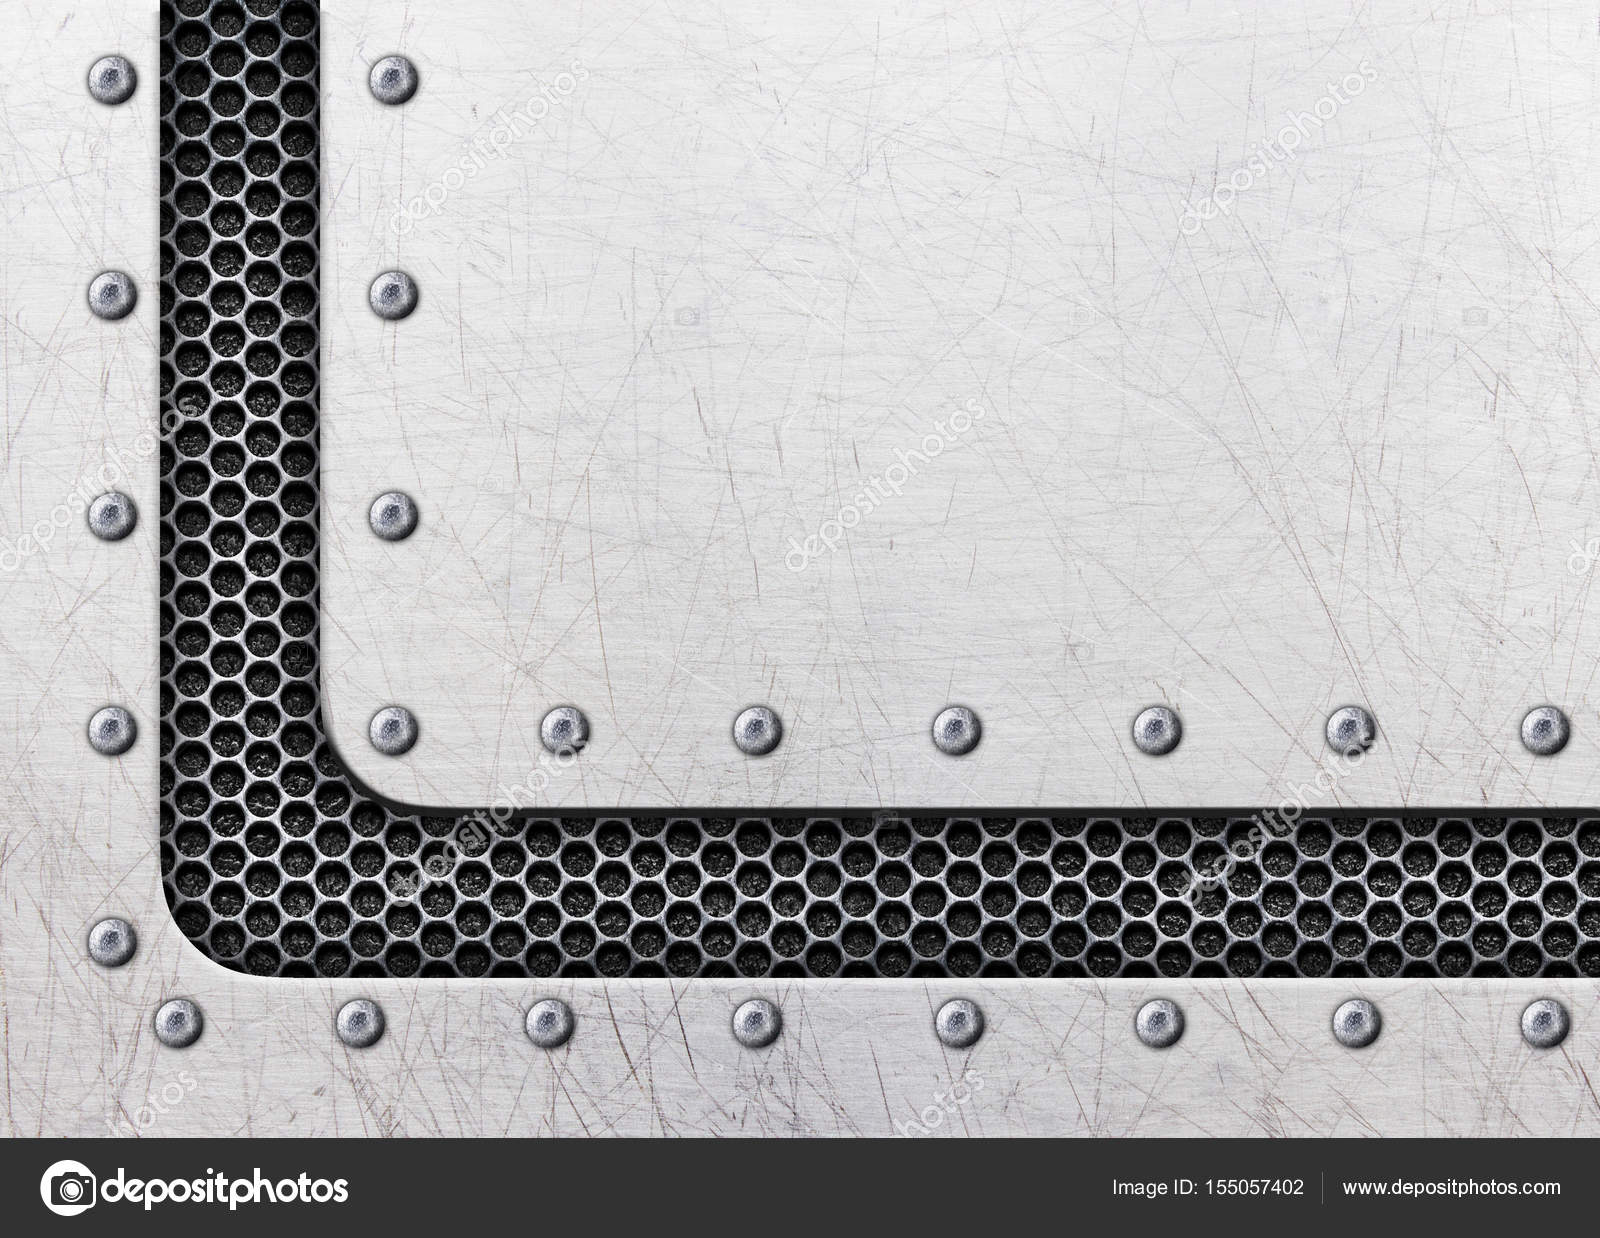 marco de acero, chapa vieja de fondo con remaches — Foto de stock ...